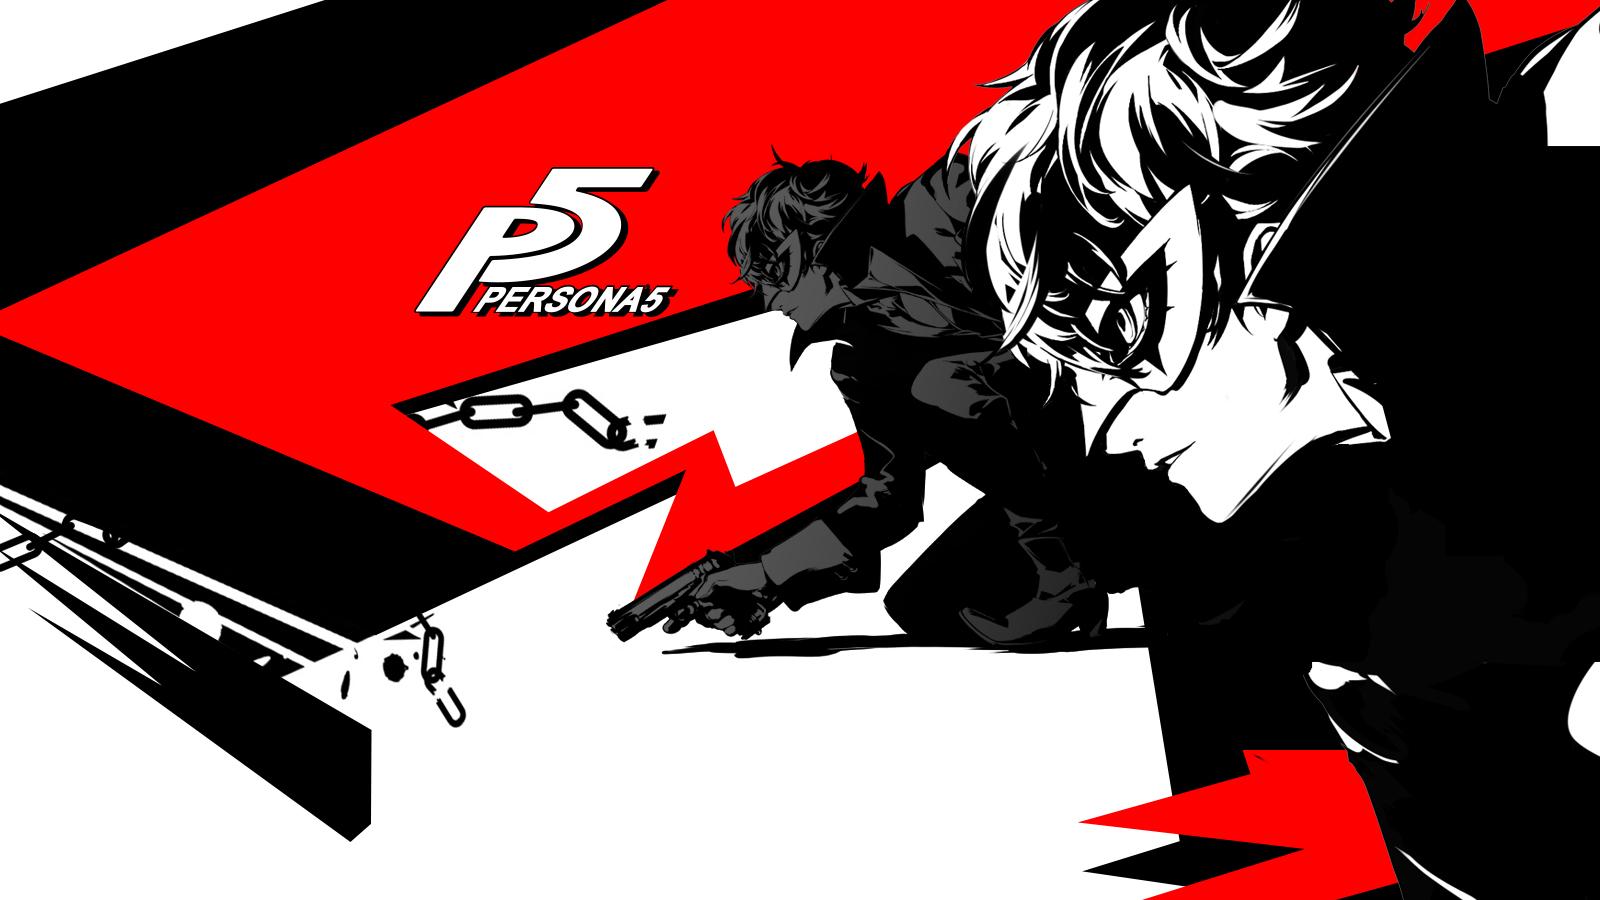 Persona 5 : Le Dernier Samouraï